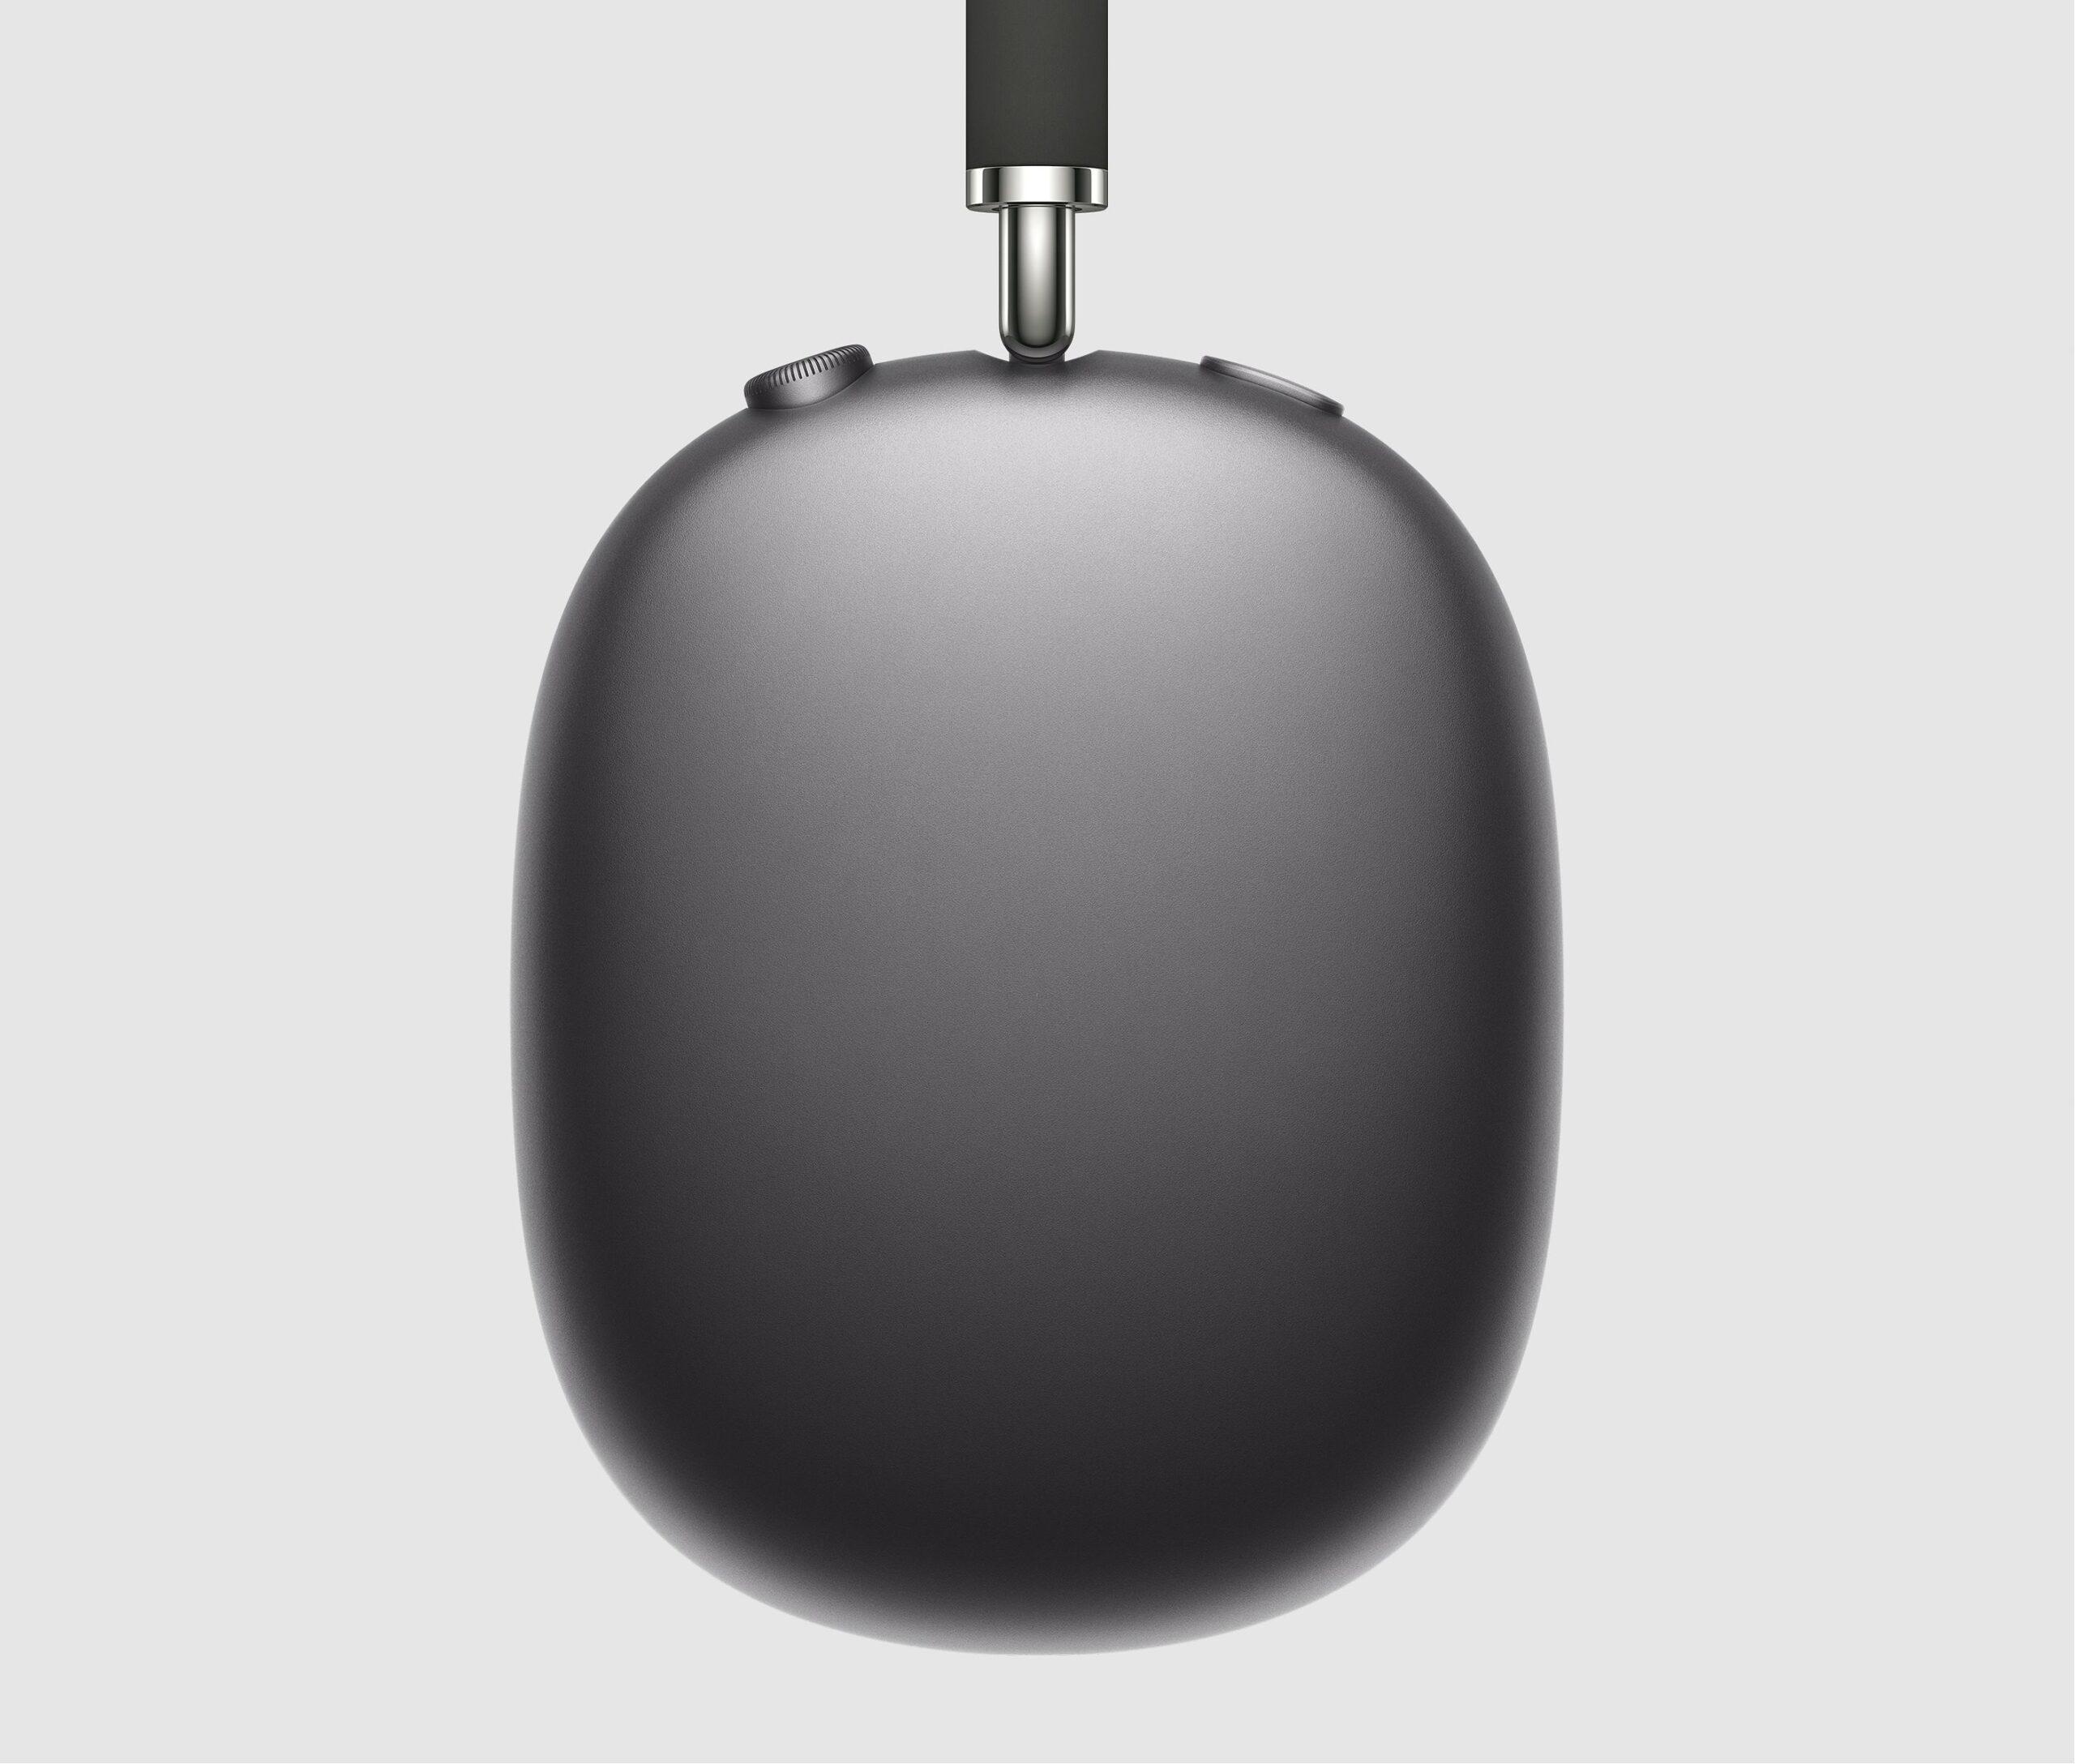 Nowe AirPods Max w kolorze Space Gray